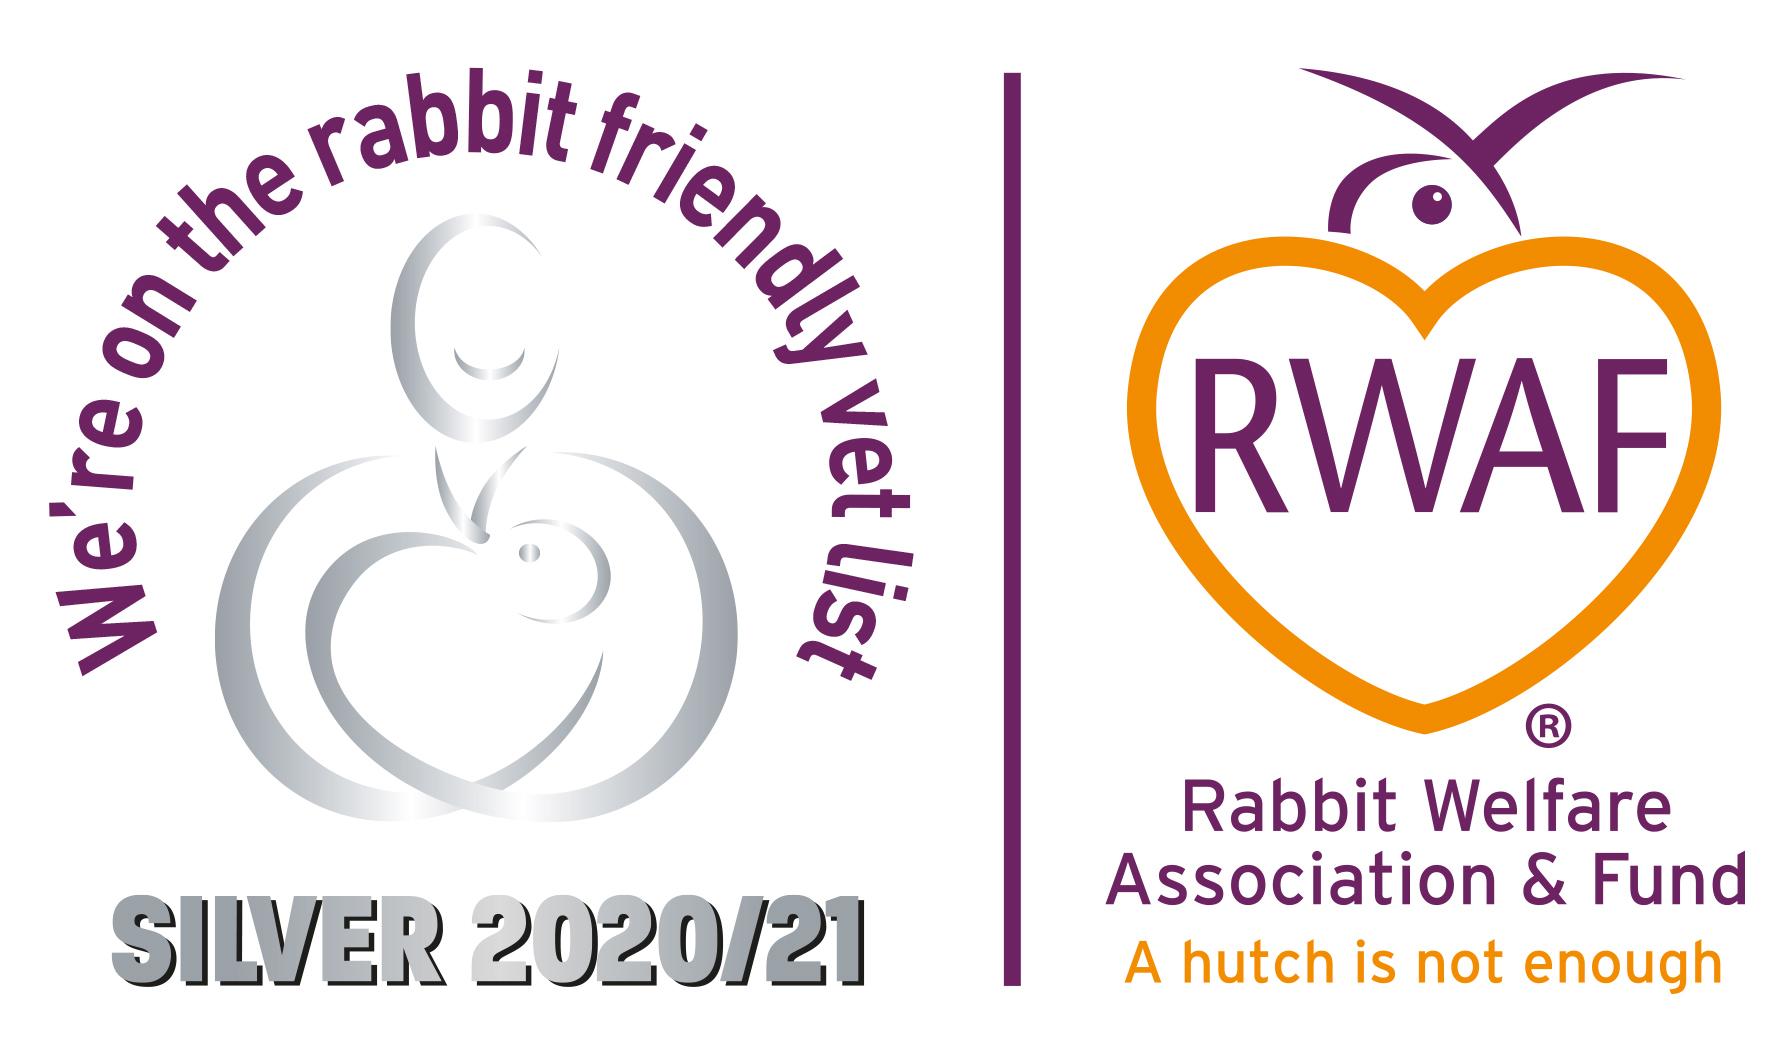 Rabbit Friendly 2020